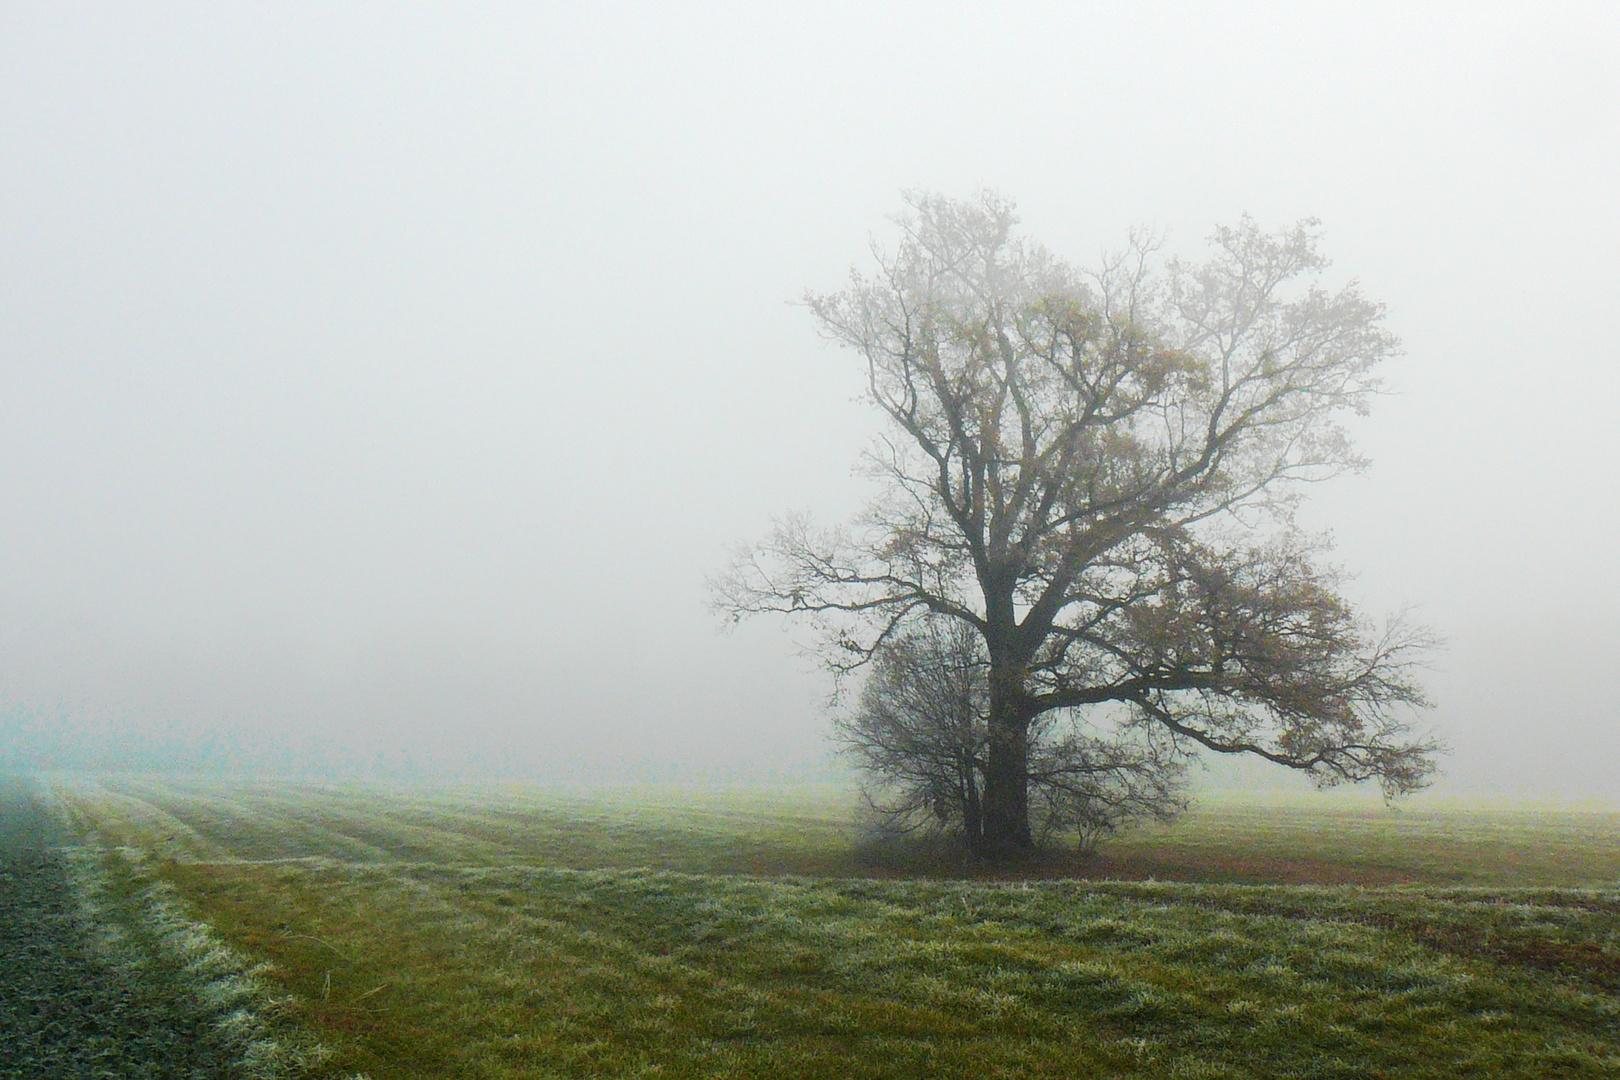 Seltsam, im Nebel zu wandern...